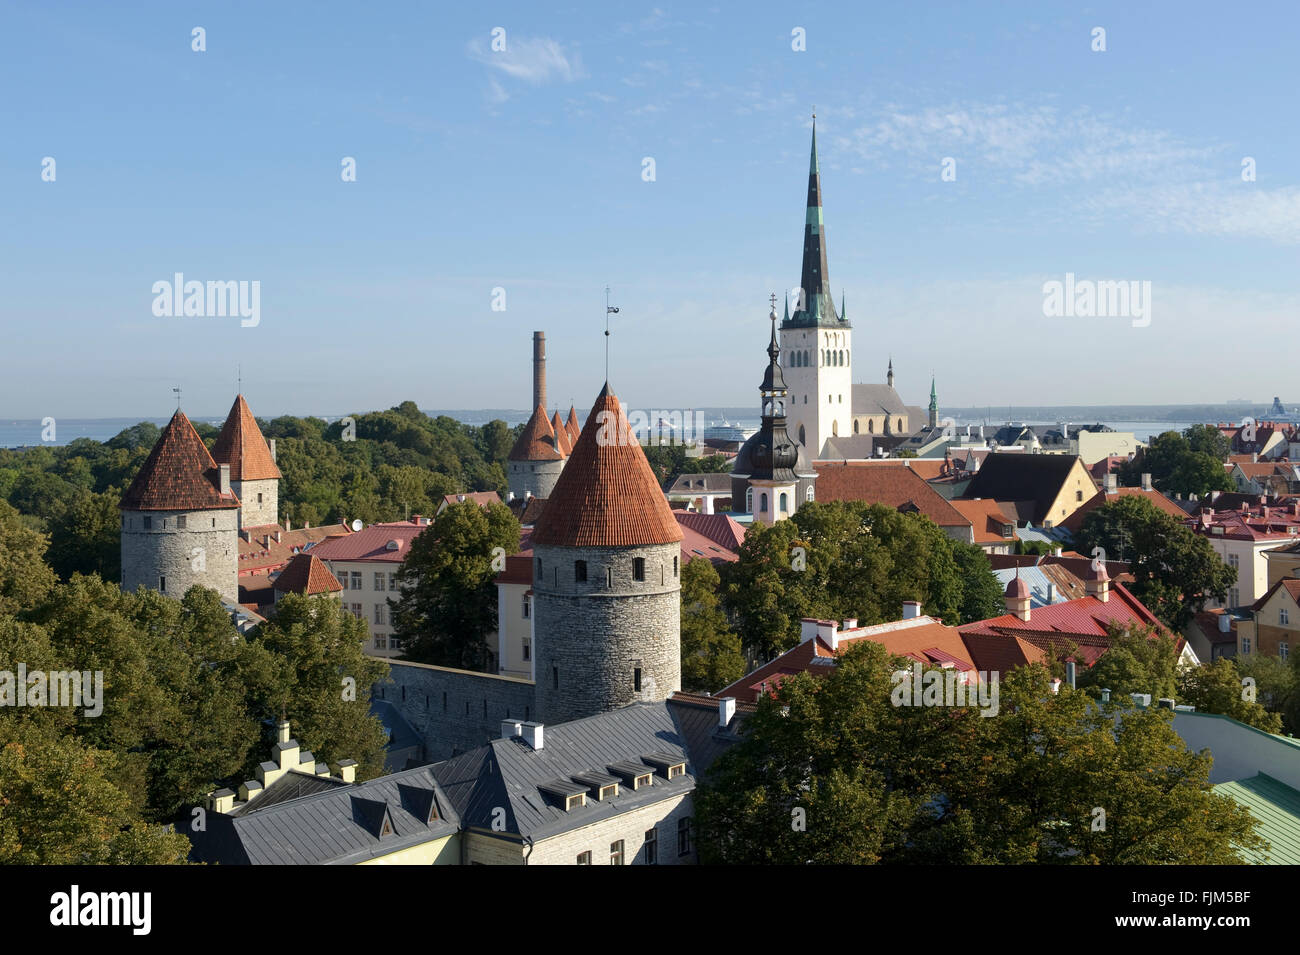 Geographie/Reisen, Estland, Tallinn, Stadtblick, Additional-Rights - Clearance-Info - Not-Available Stockbild